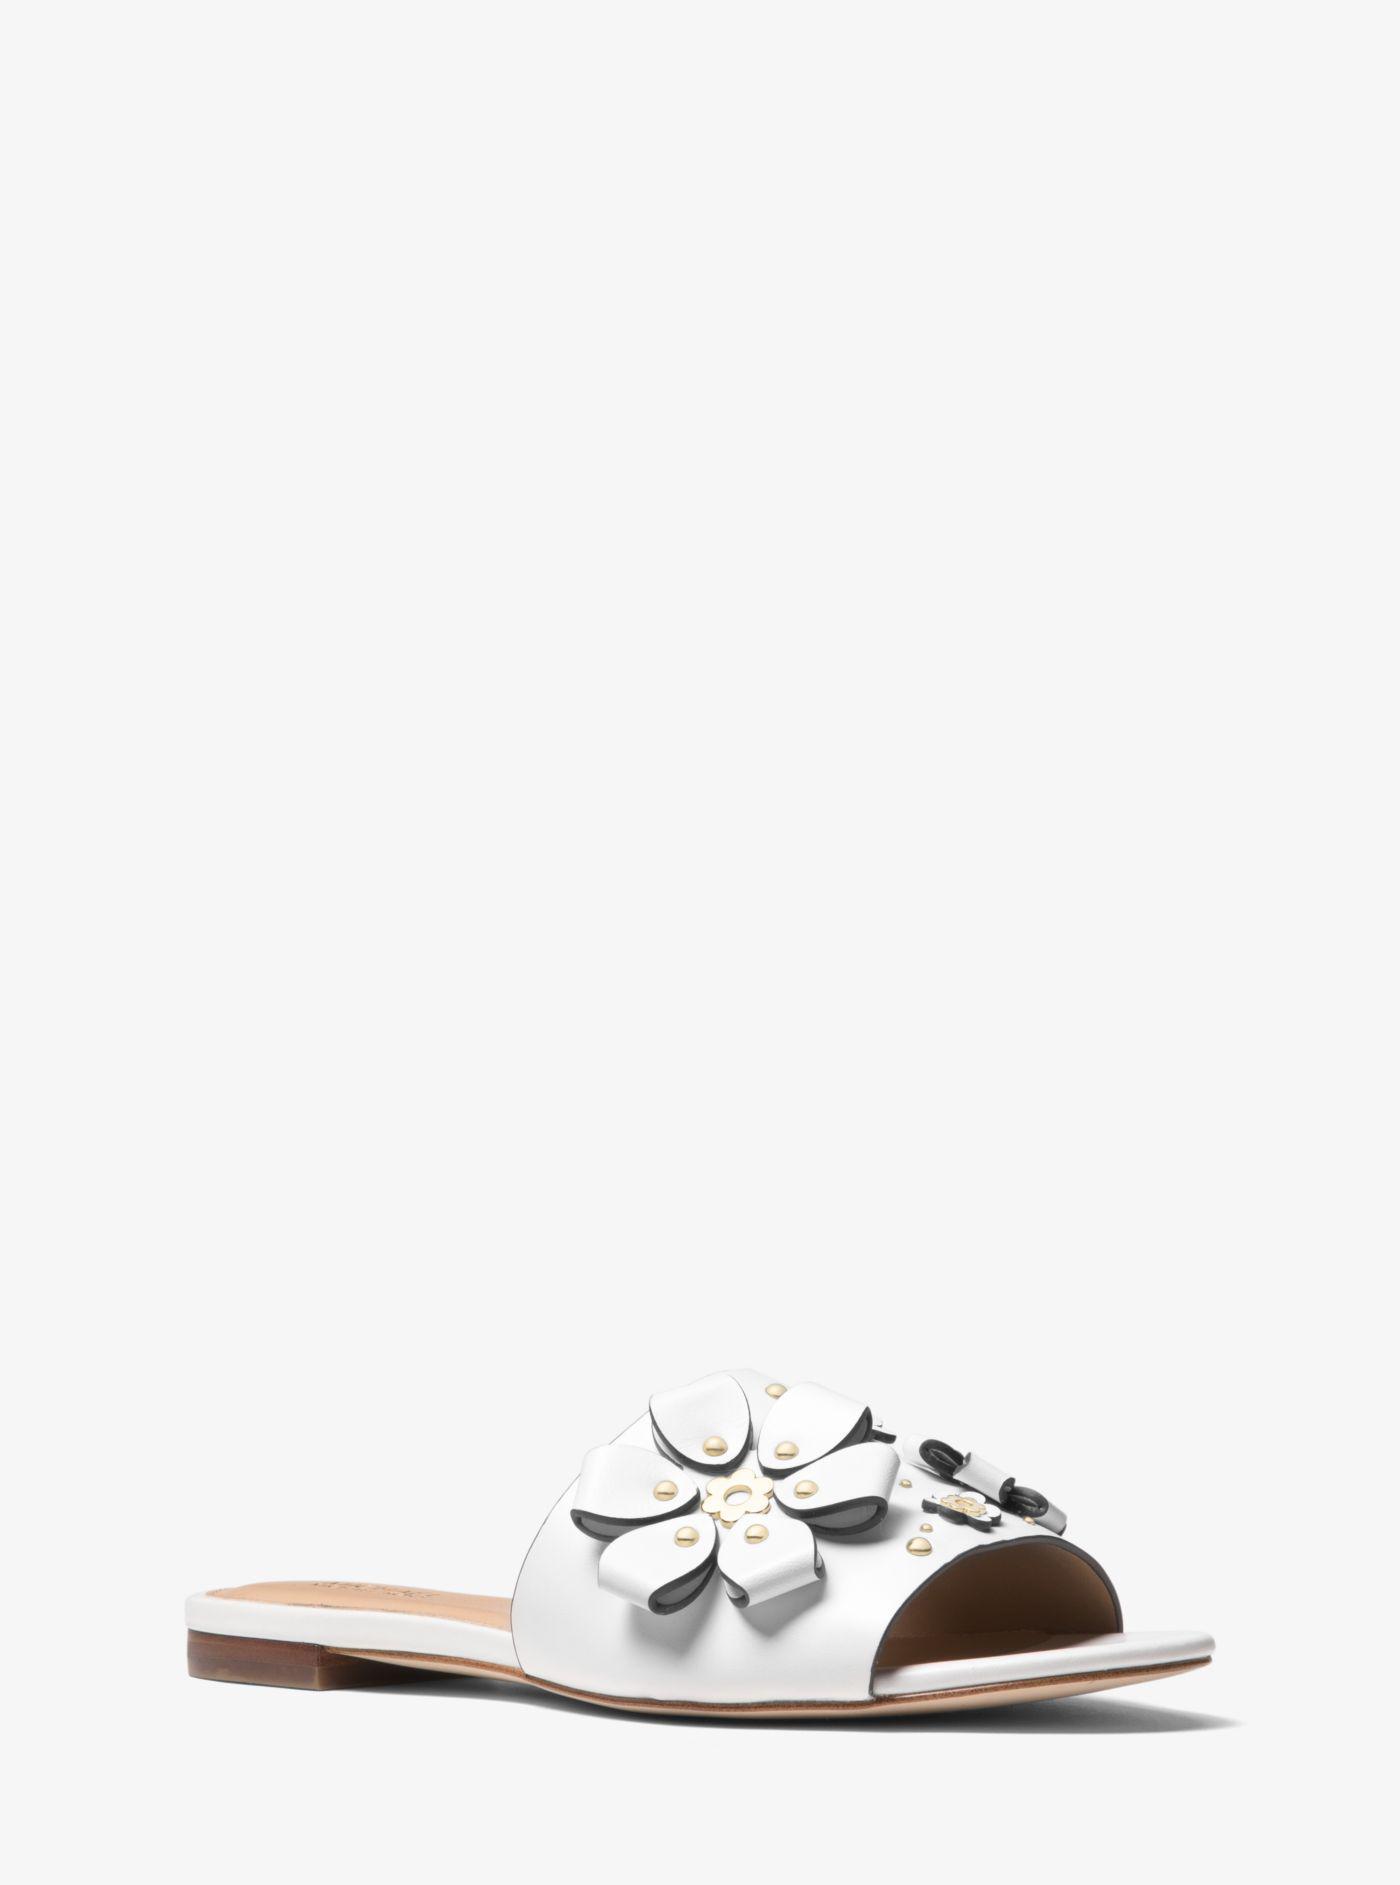 d6c159b8935 Lyst - Michael Kors Tara Floral Embellished Leather Slide in White